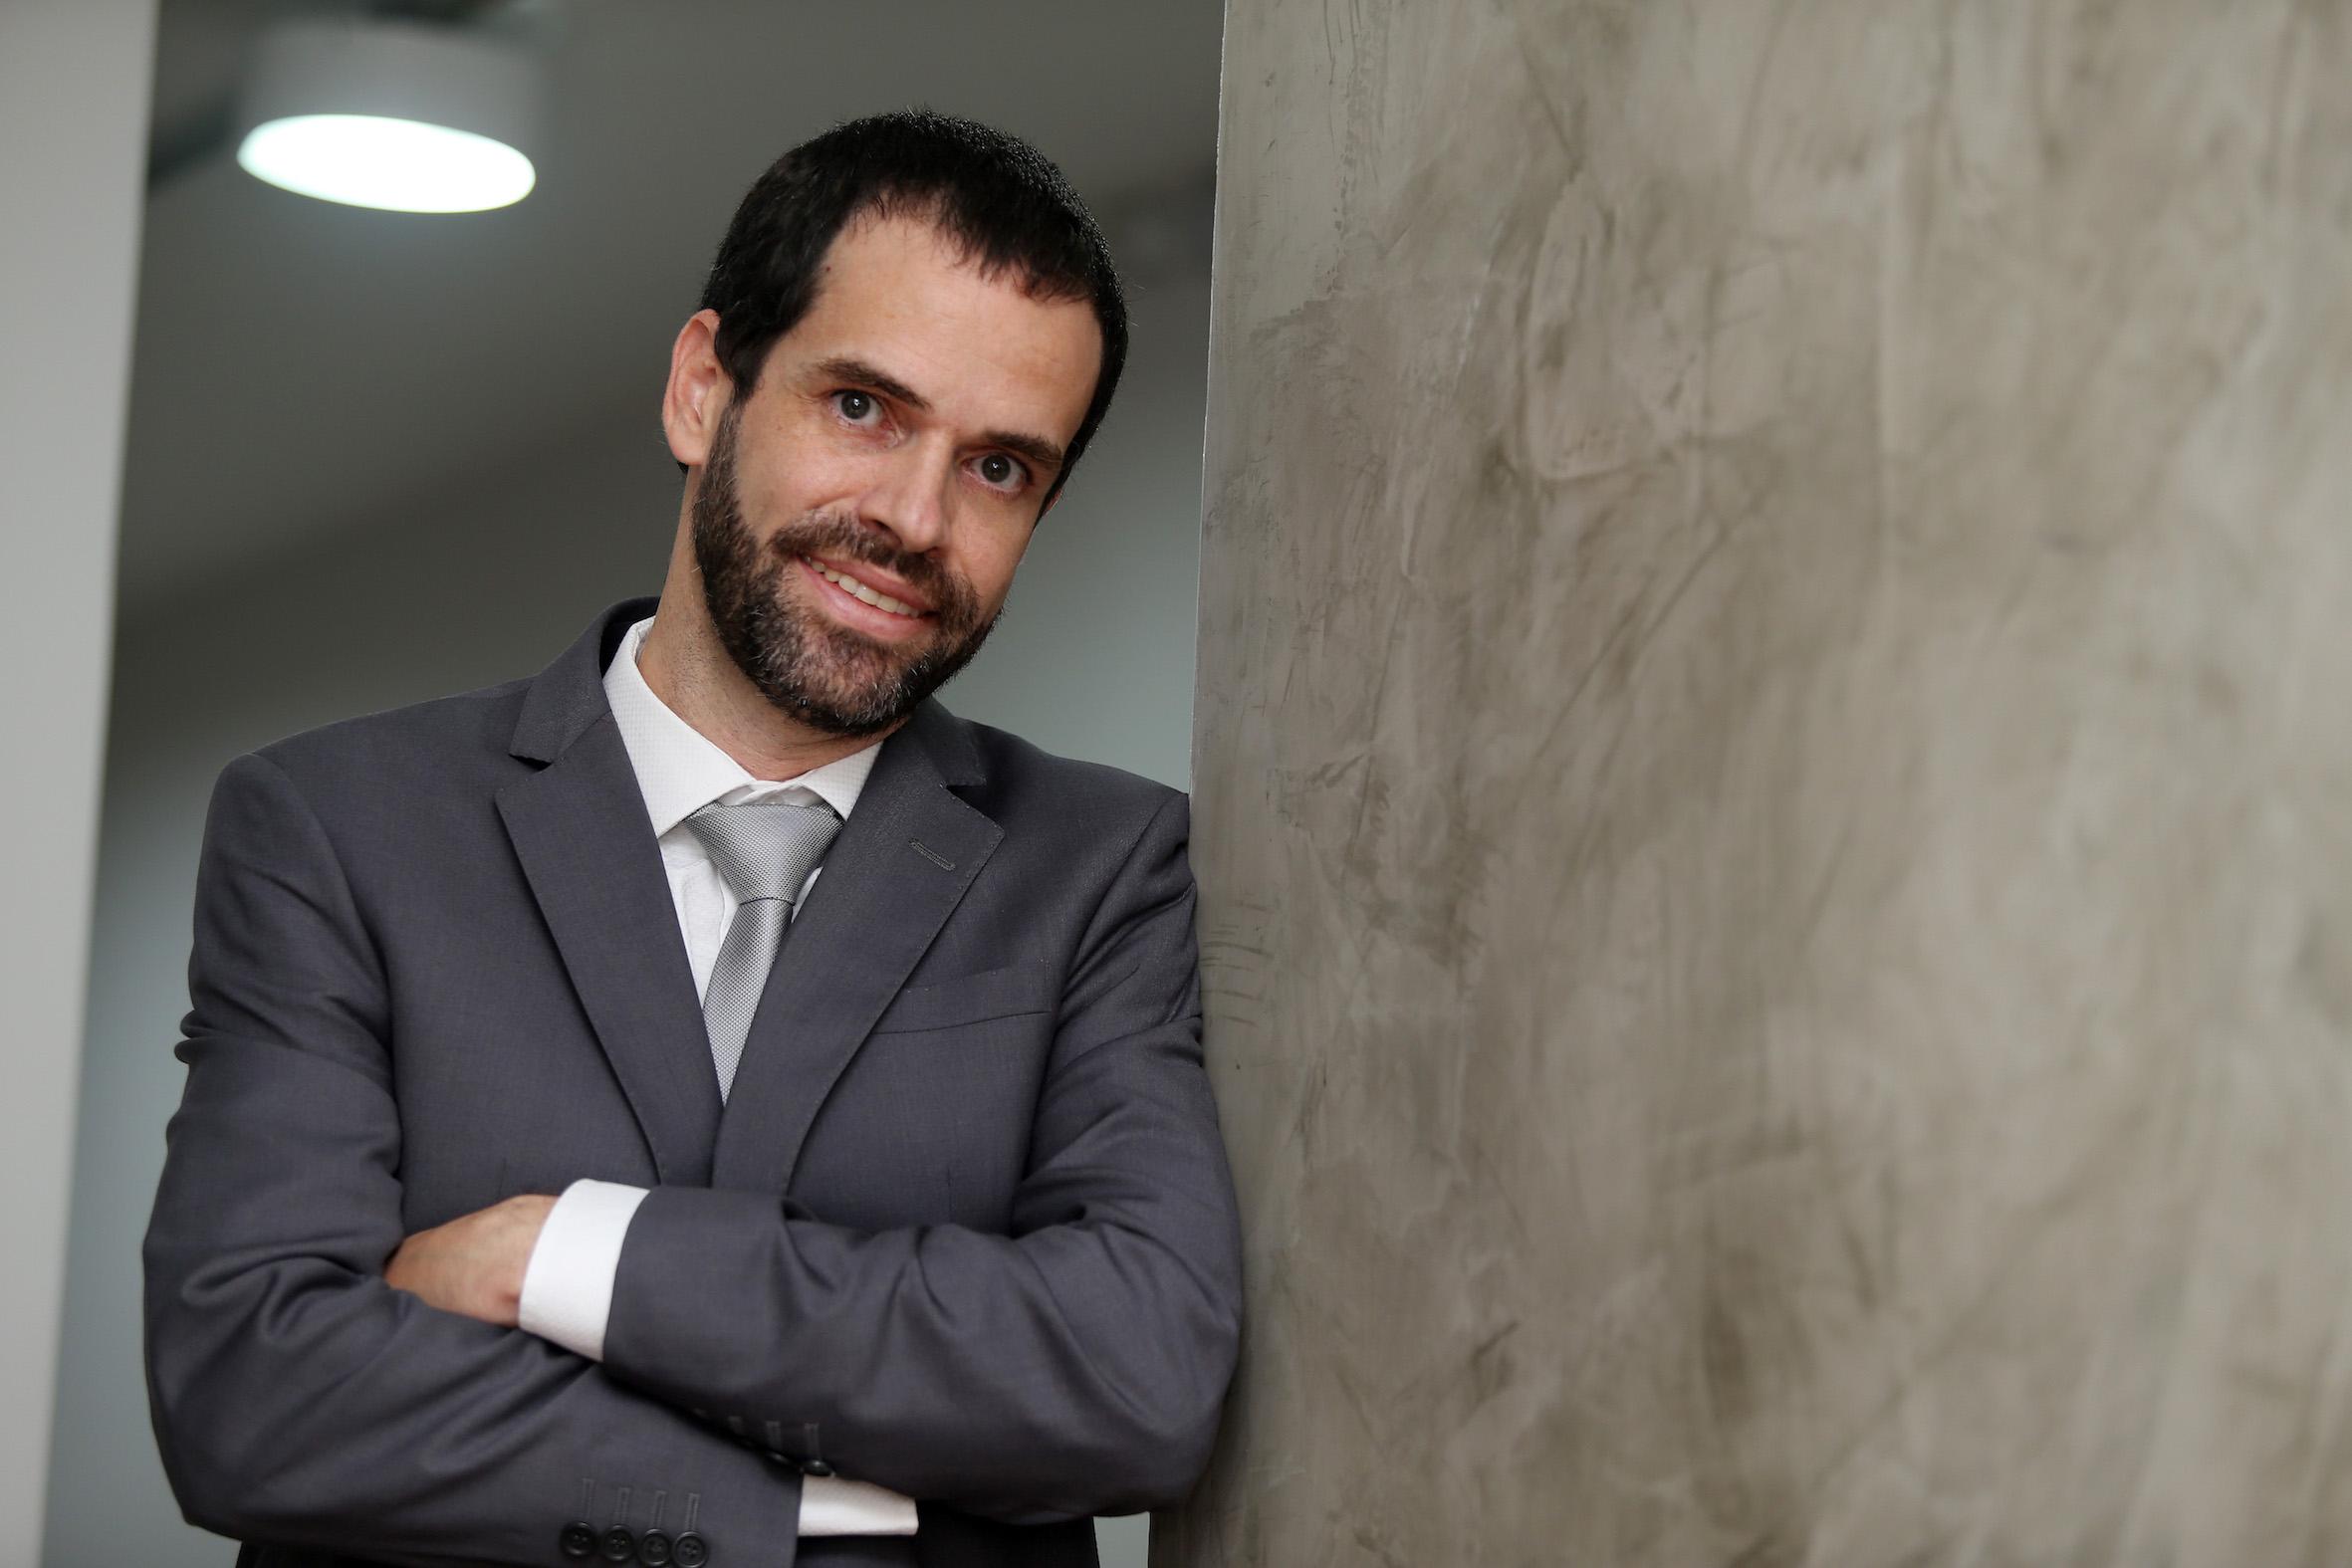 EDC - Daniel Machado de Campos Neto